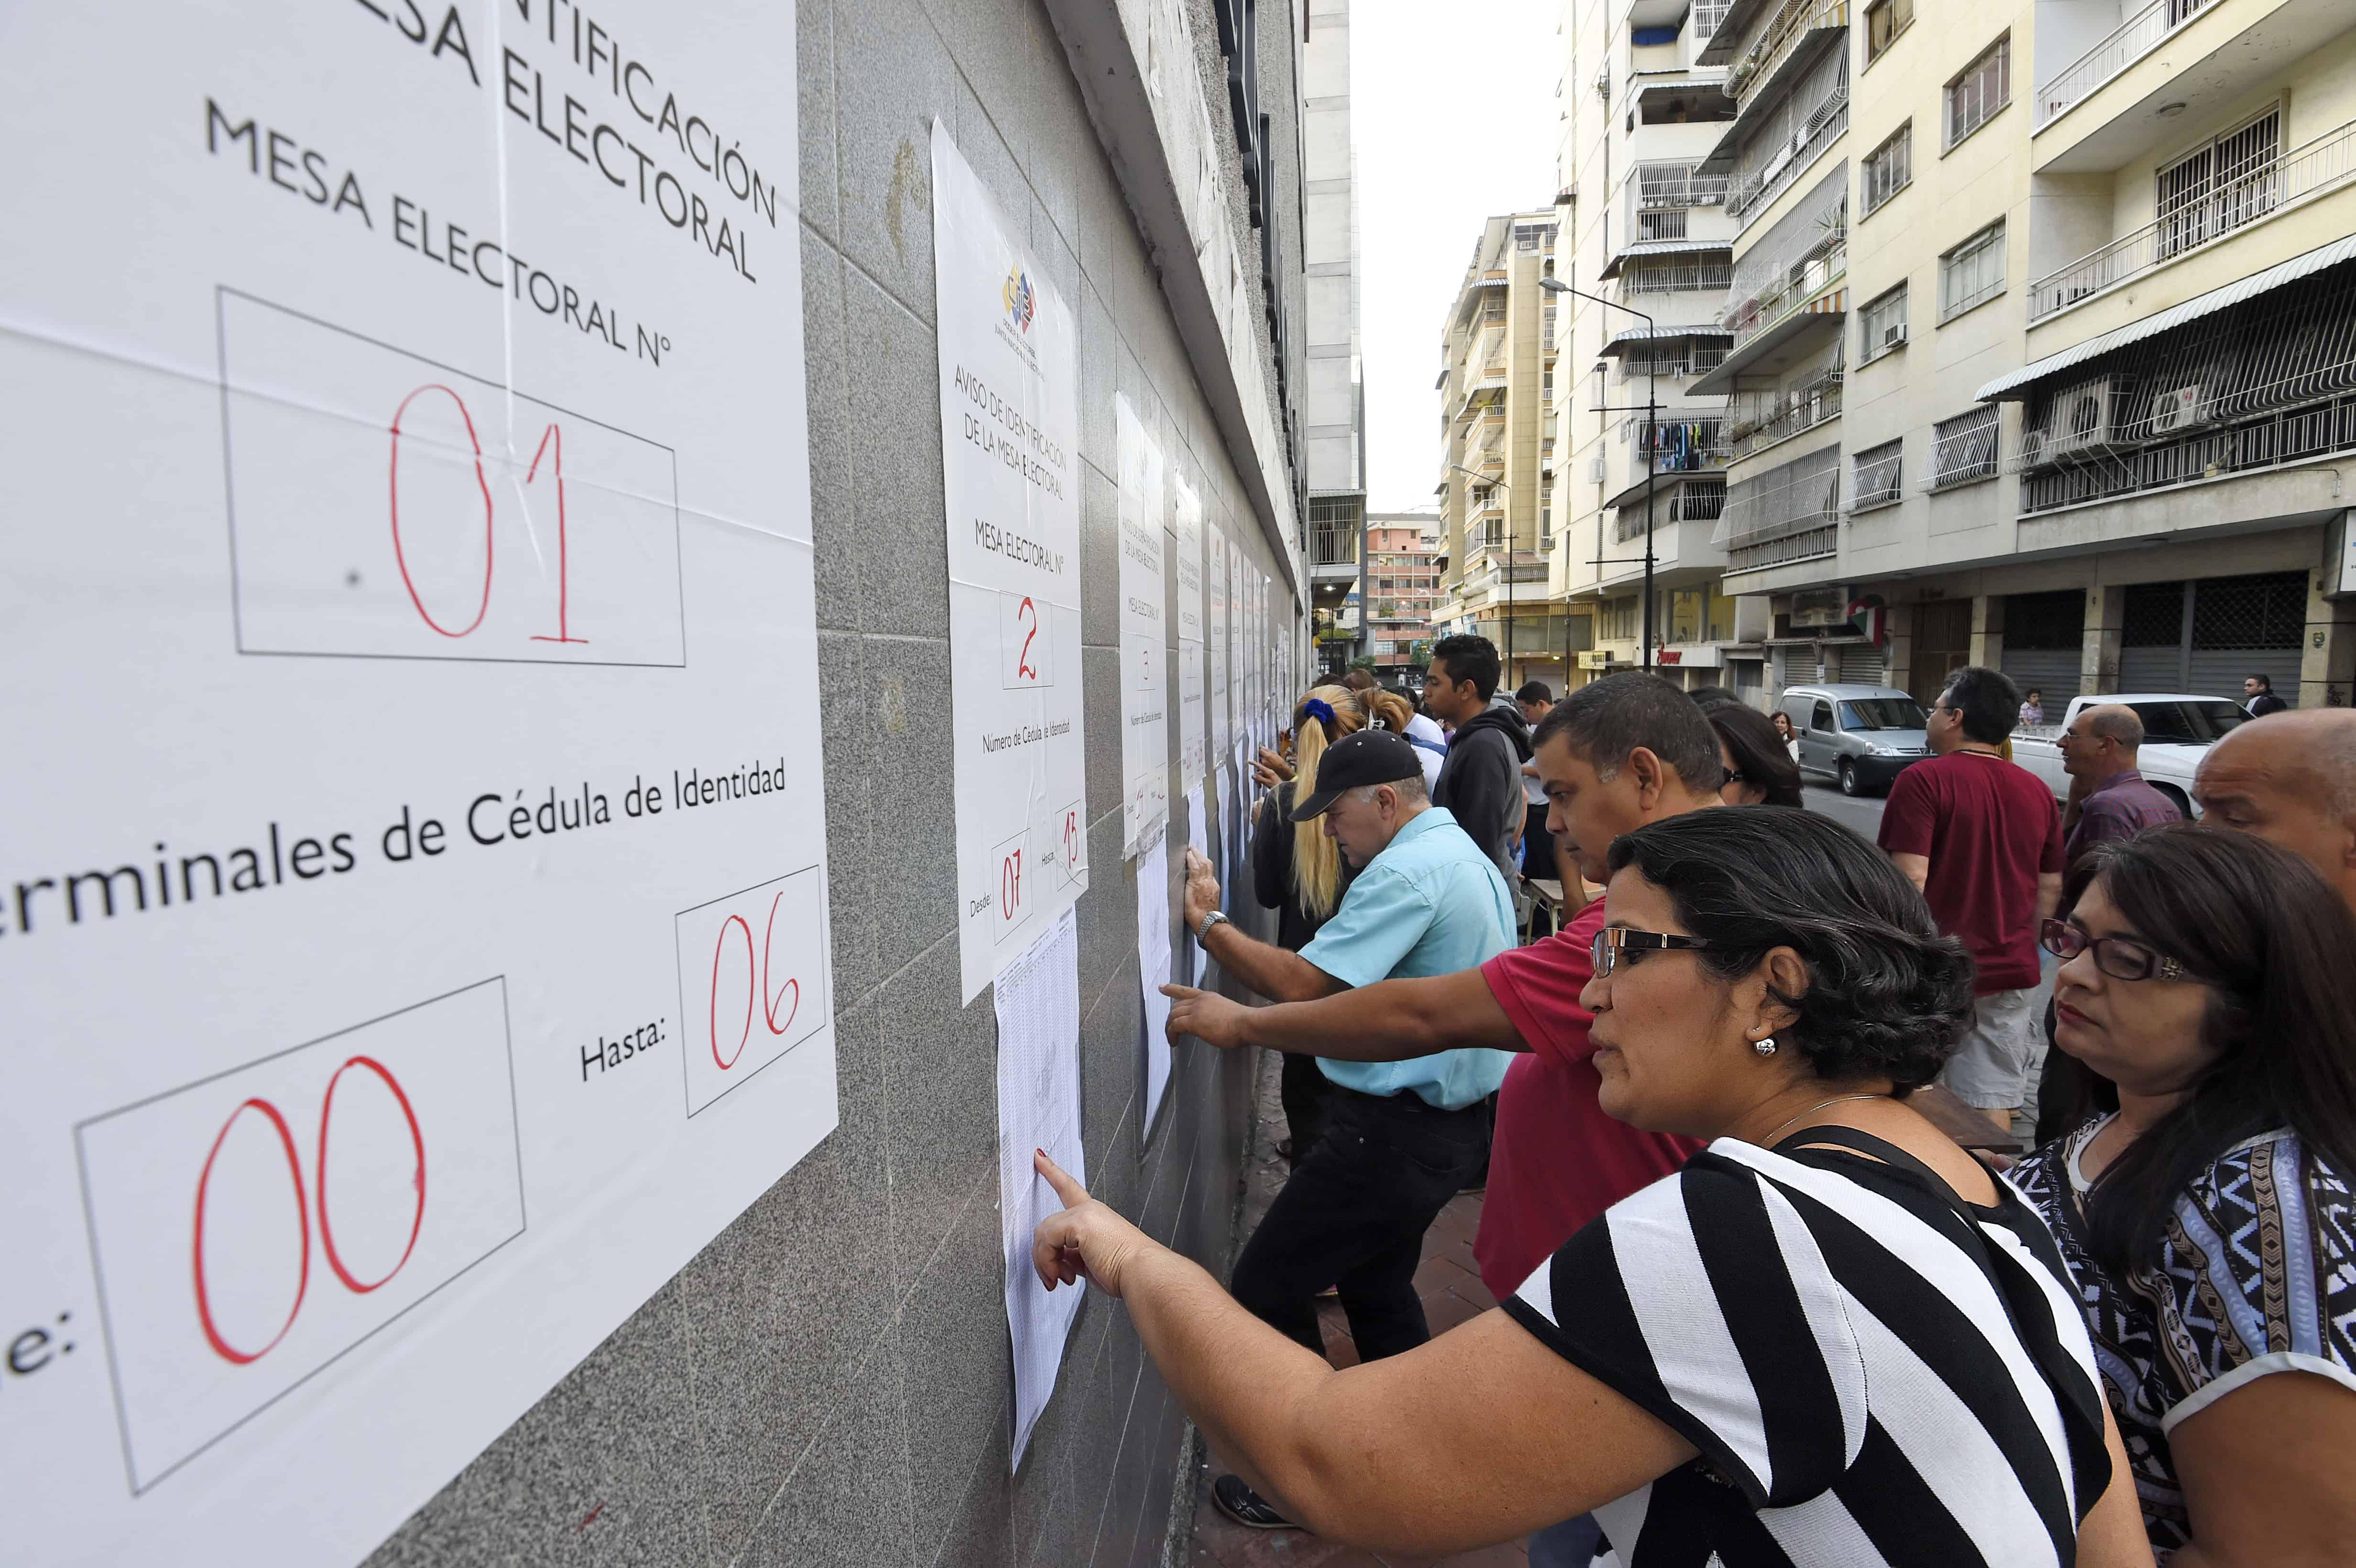 Venezuela elections, voter lists